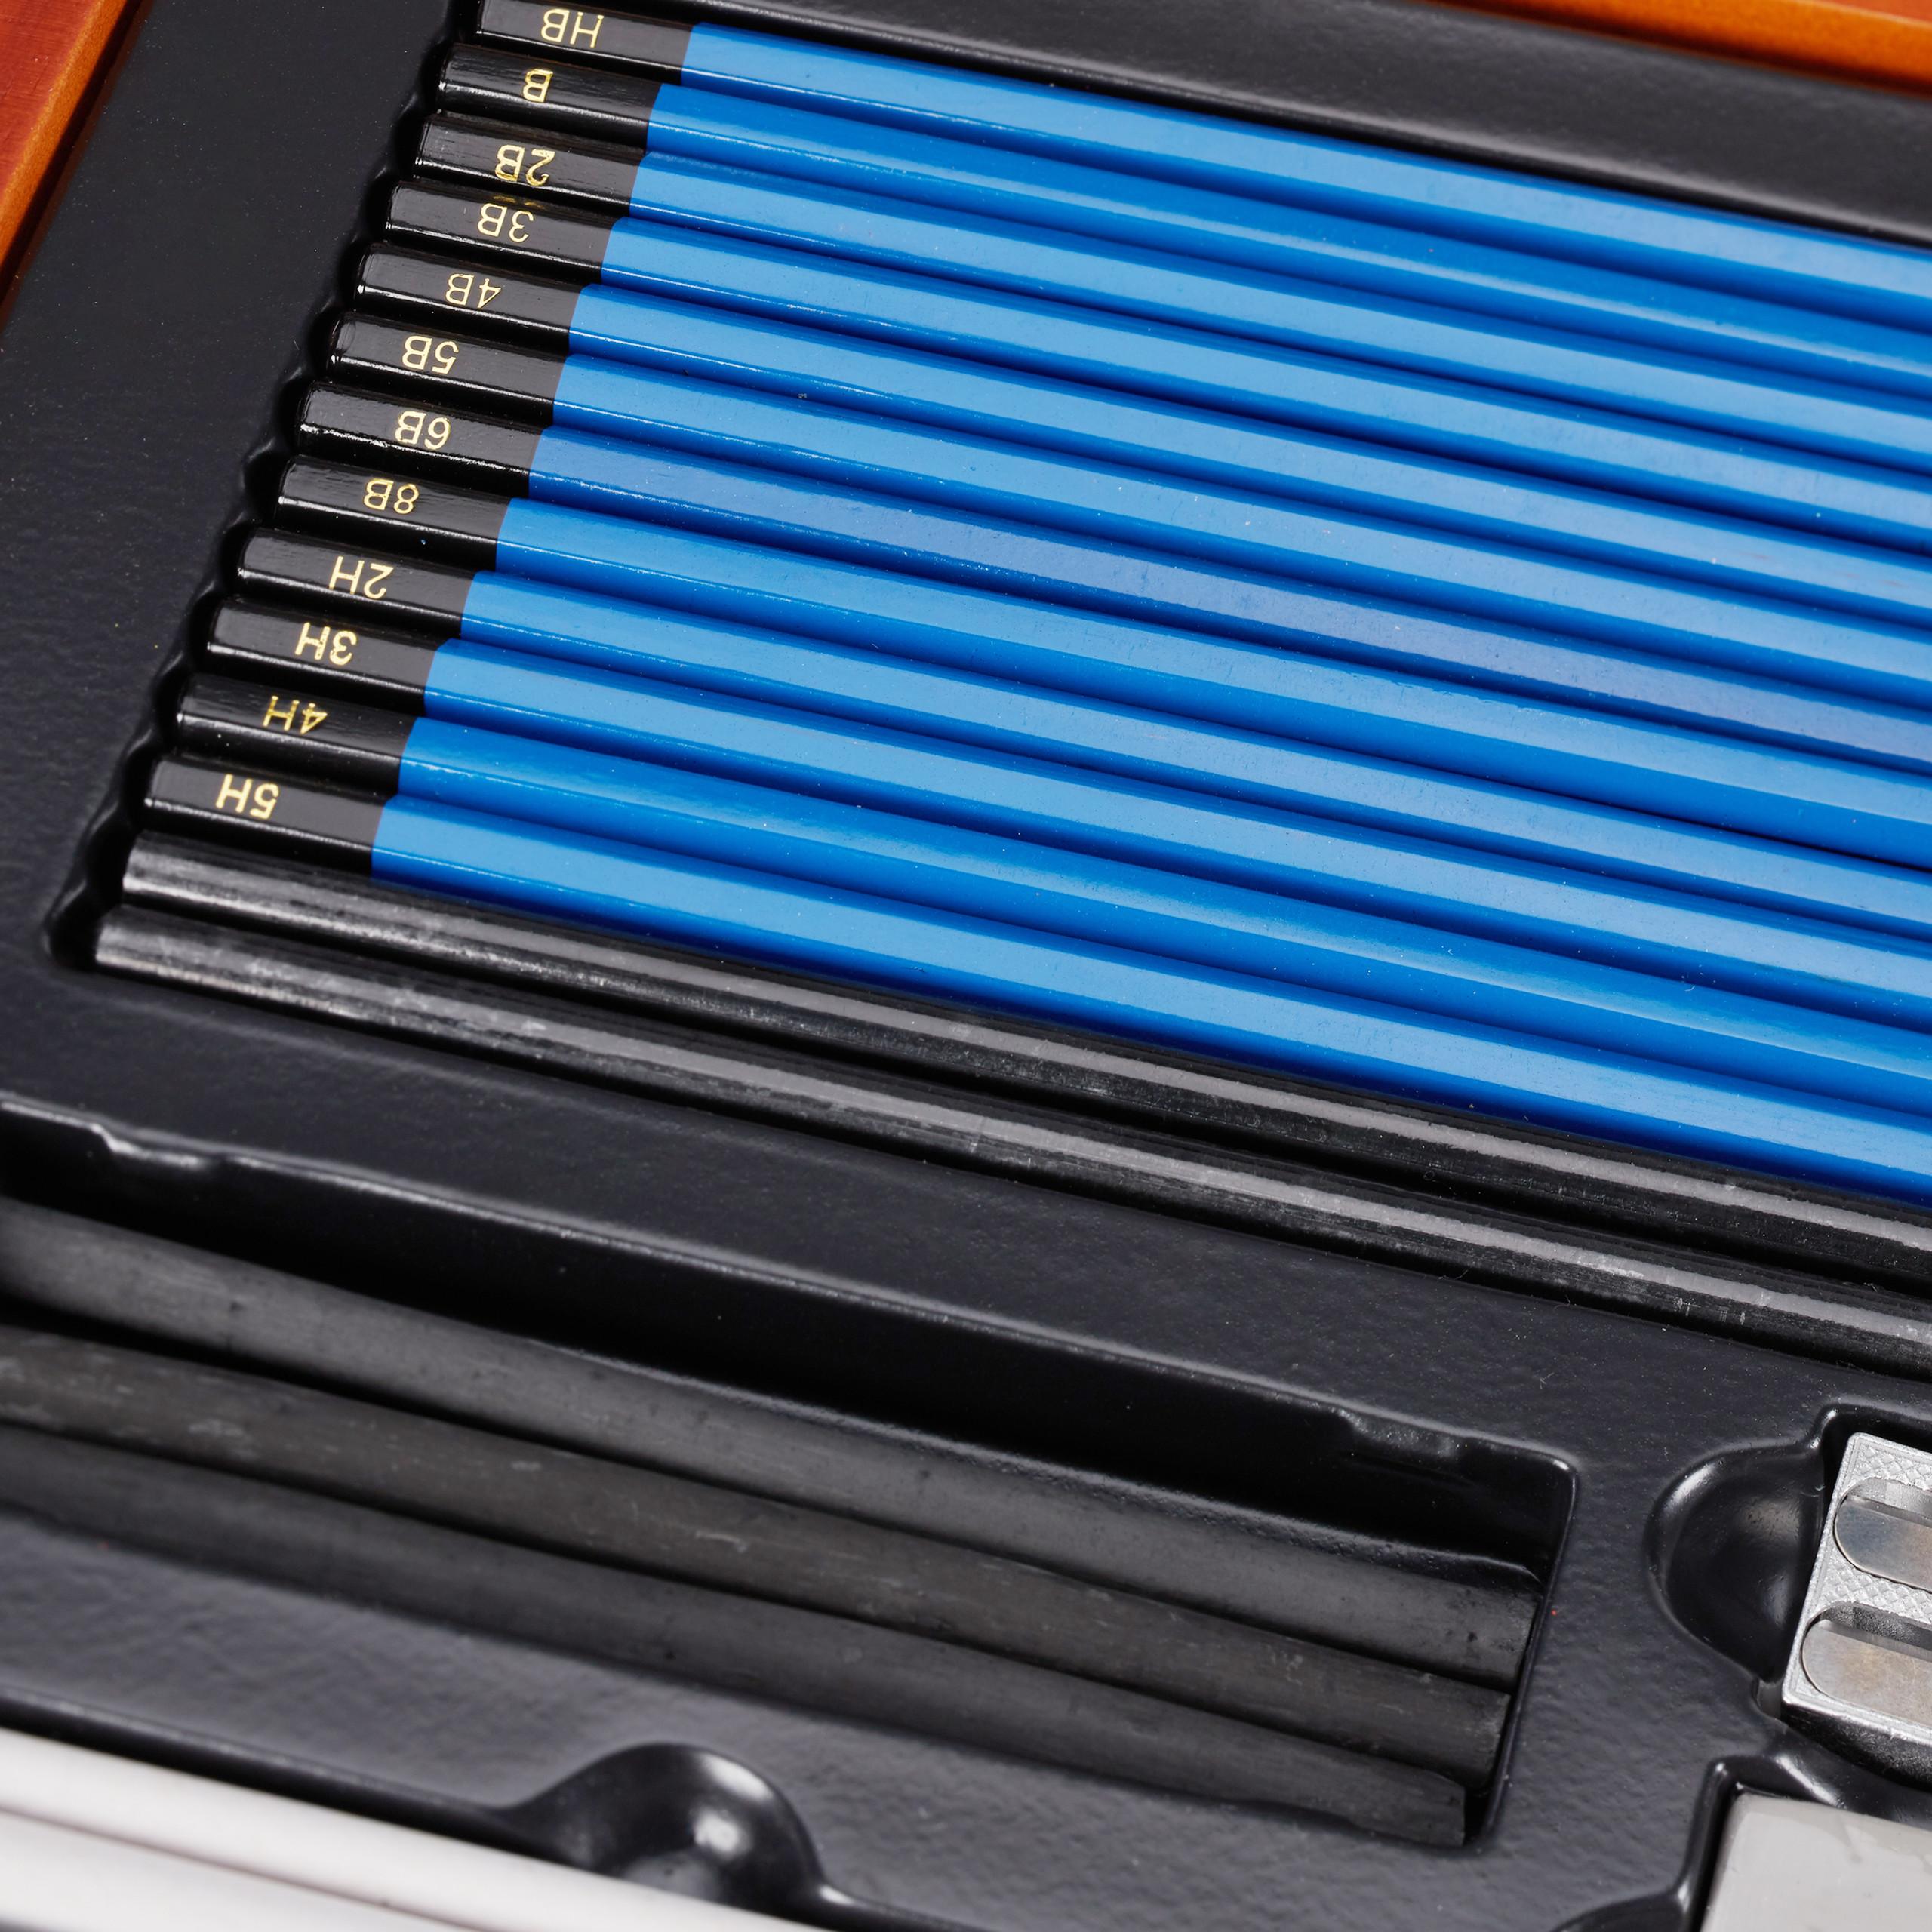 tekenset-hout-tekenkoffer-tekenspullen-tekendoos-48-delig miniatuur 9